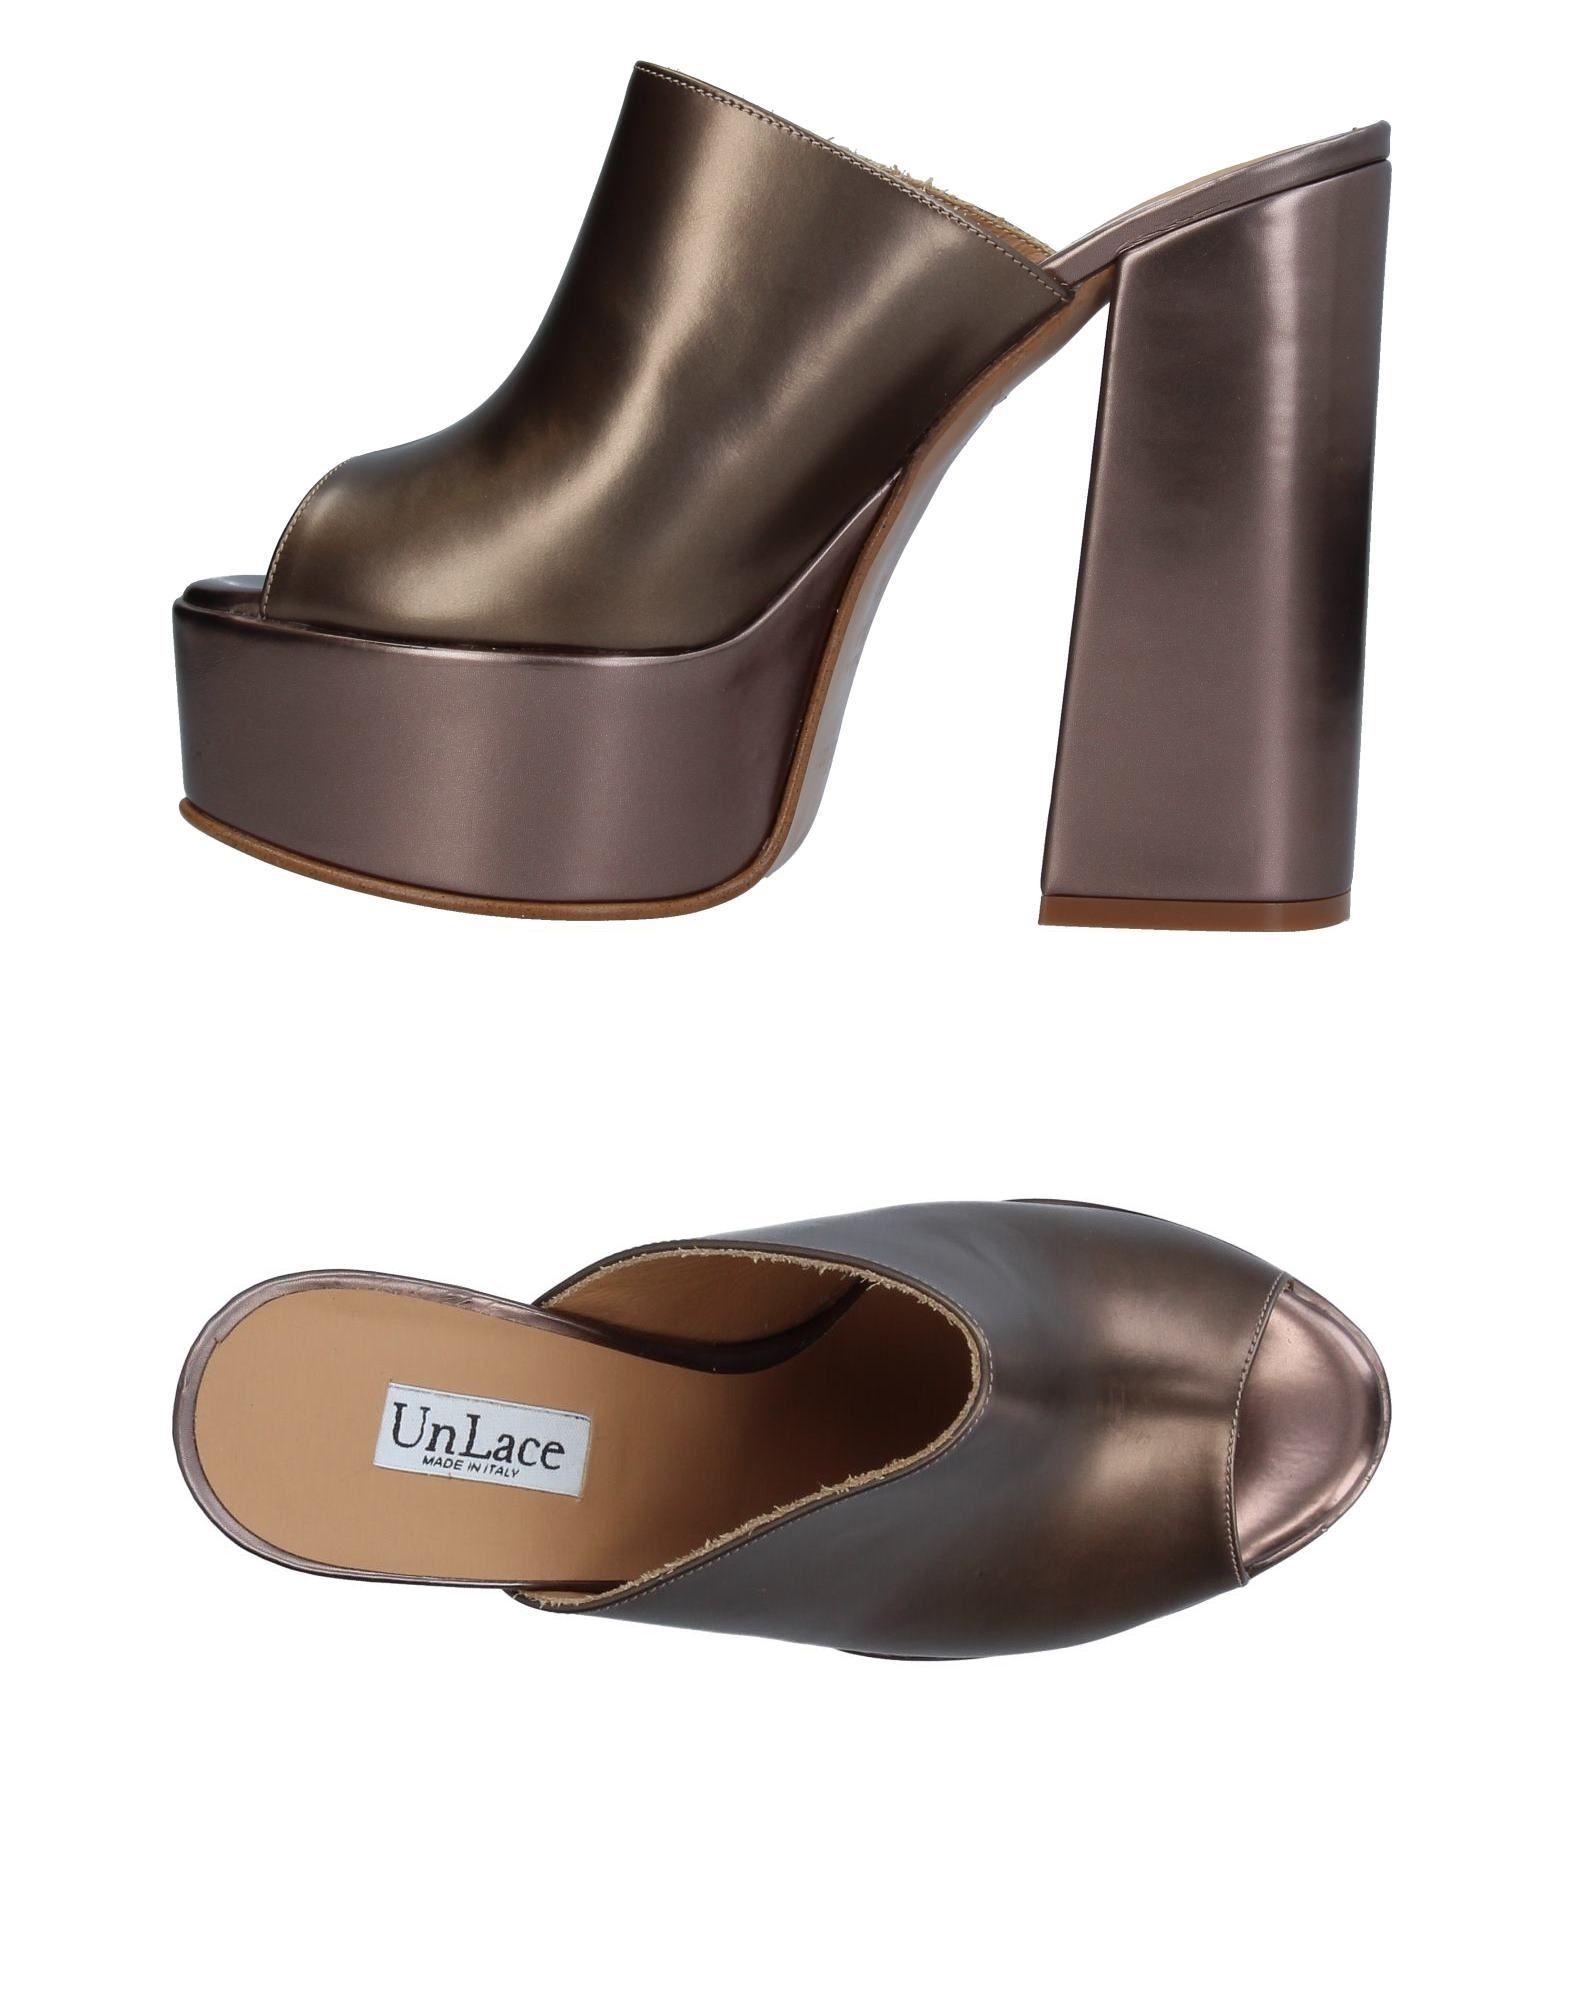 Unlace Gute Sandalen Damen  11373676SQ Gute Unlace Qualität beliebte Schuhe c5308d